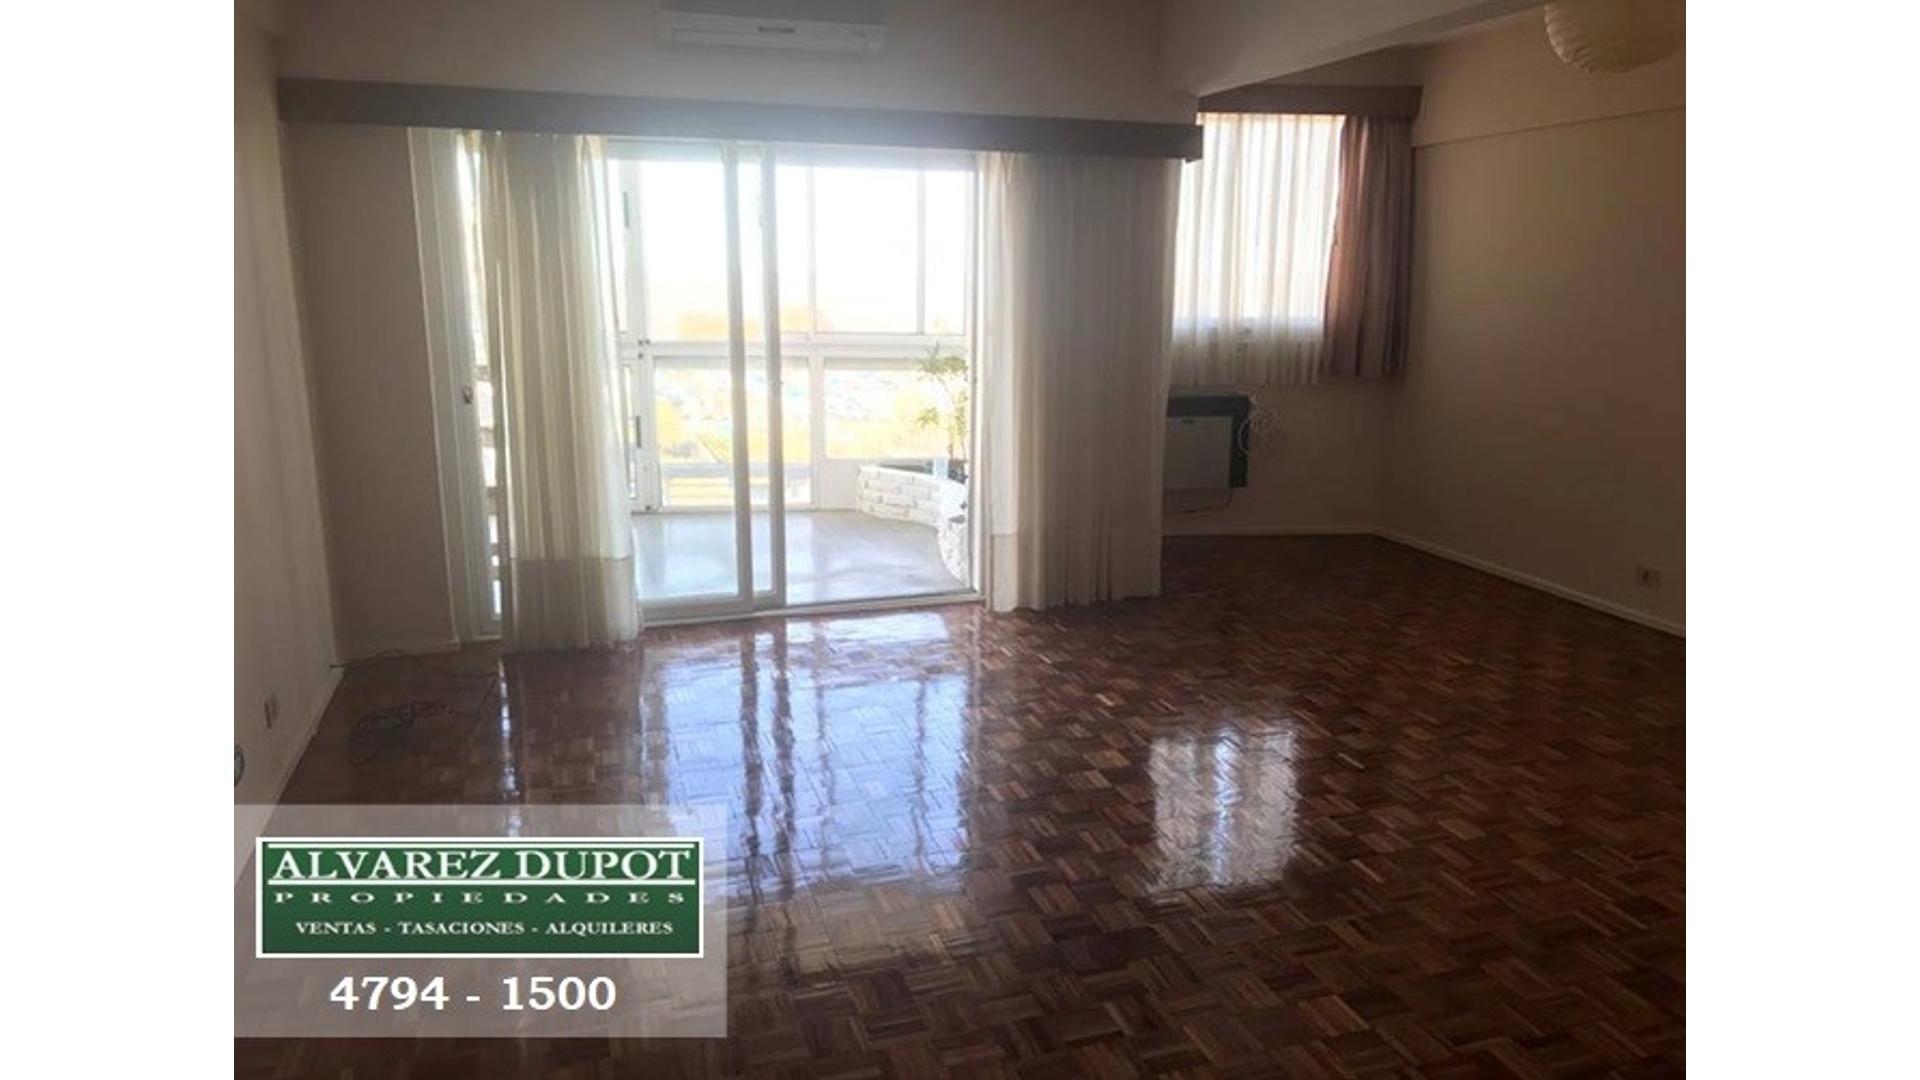 Departamento - Alquiler - Argentina, Vicente López - Av. Del Libertador 2600